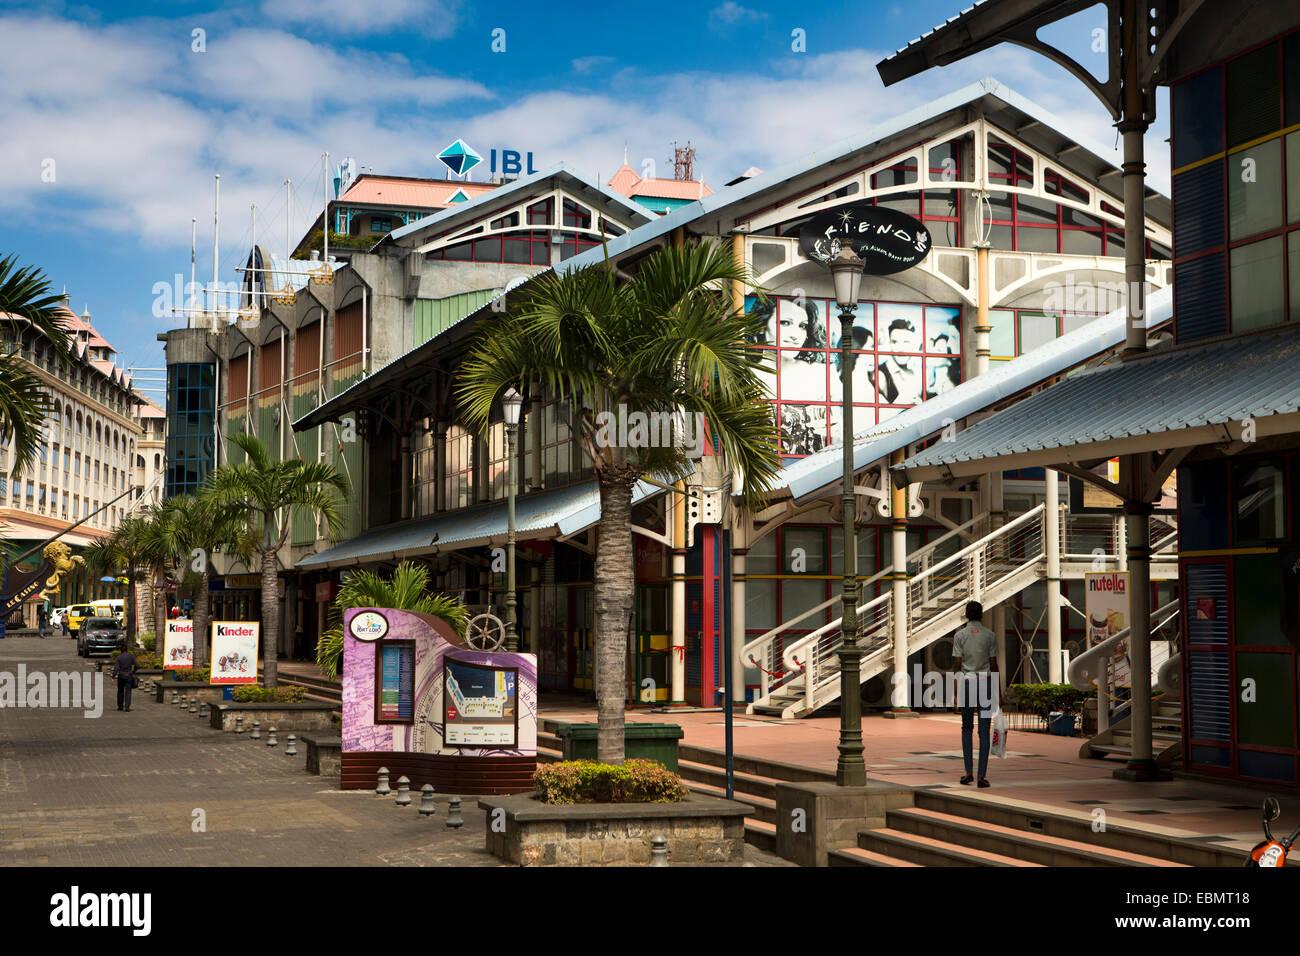 Mauritius port louis stock photos mauritius port louis - Restaurants in port louis mauritius ...